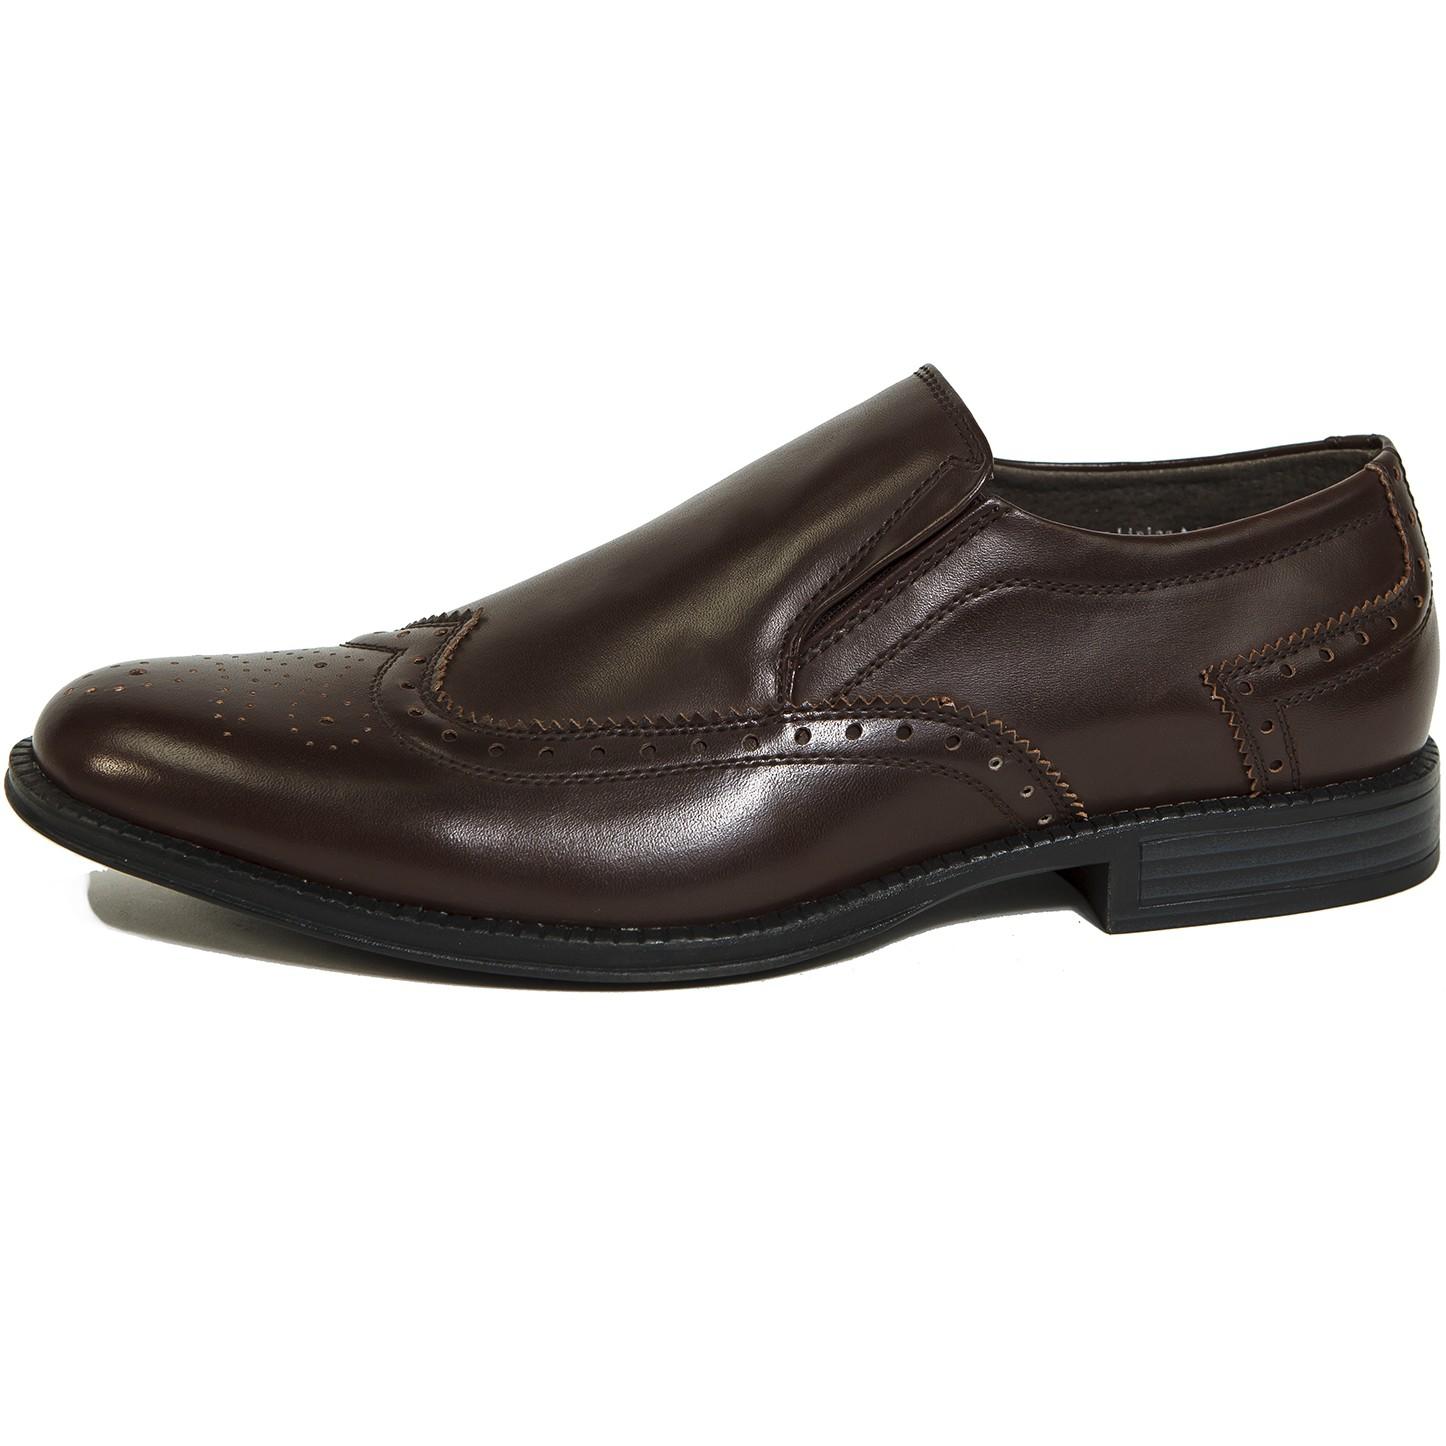 Alpine Swiss Basel Men's Wing Tip Dress Shoes Brogue Medallion Slip On Loafers